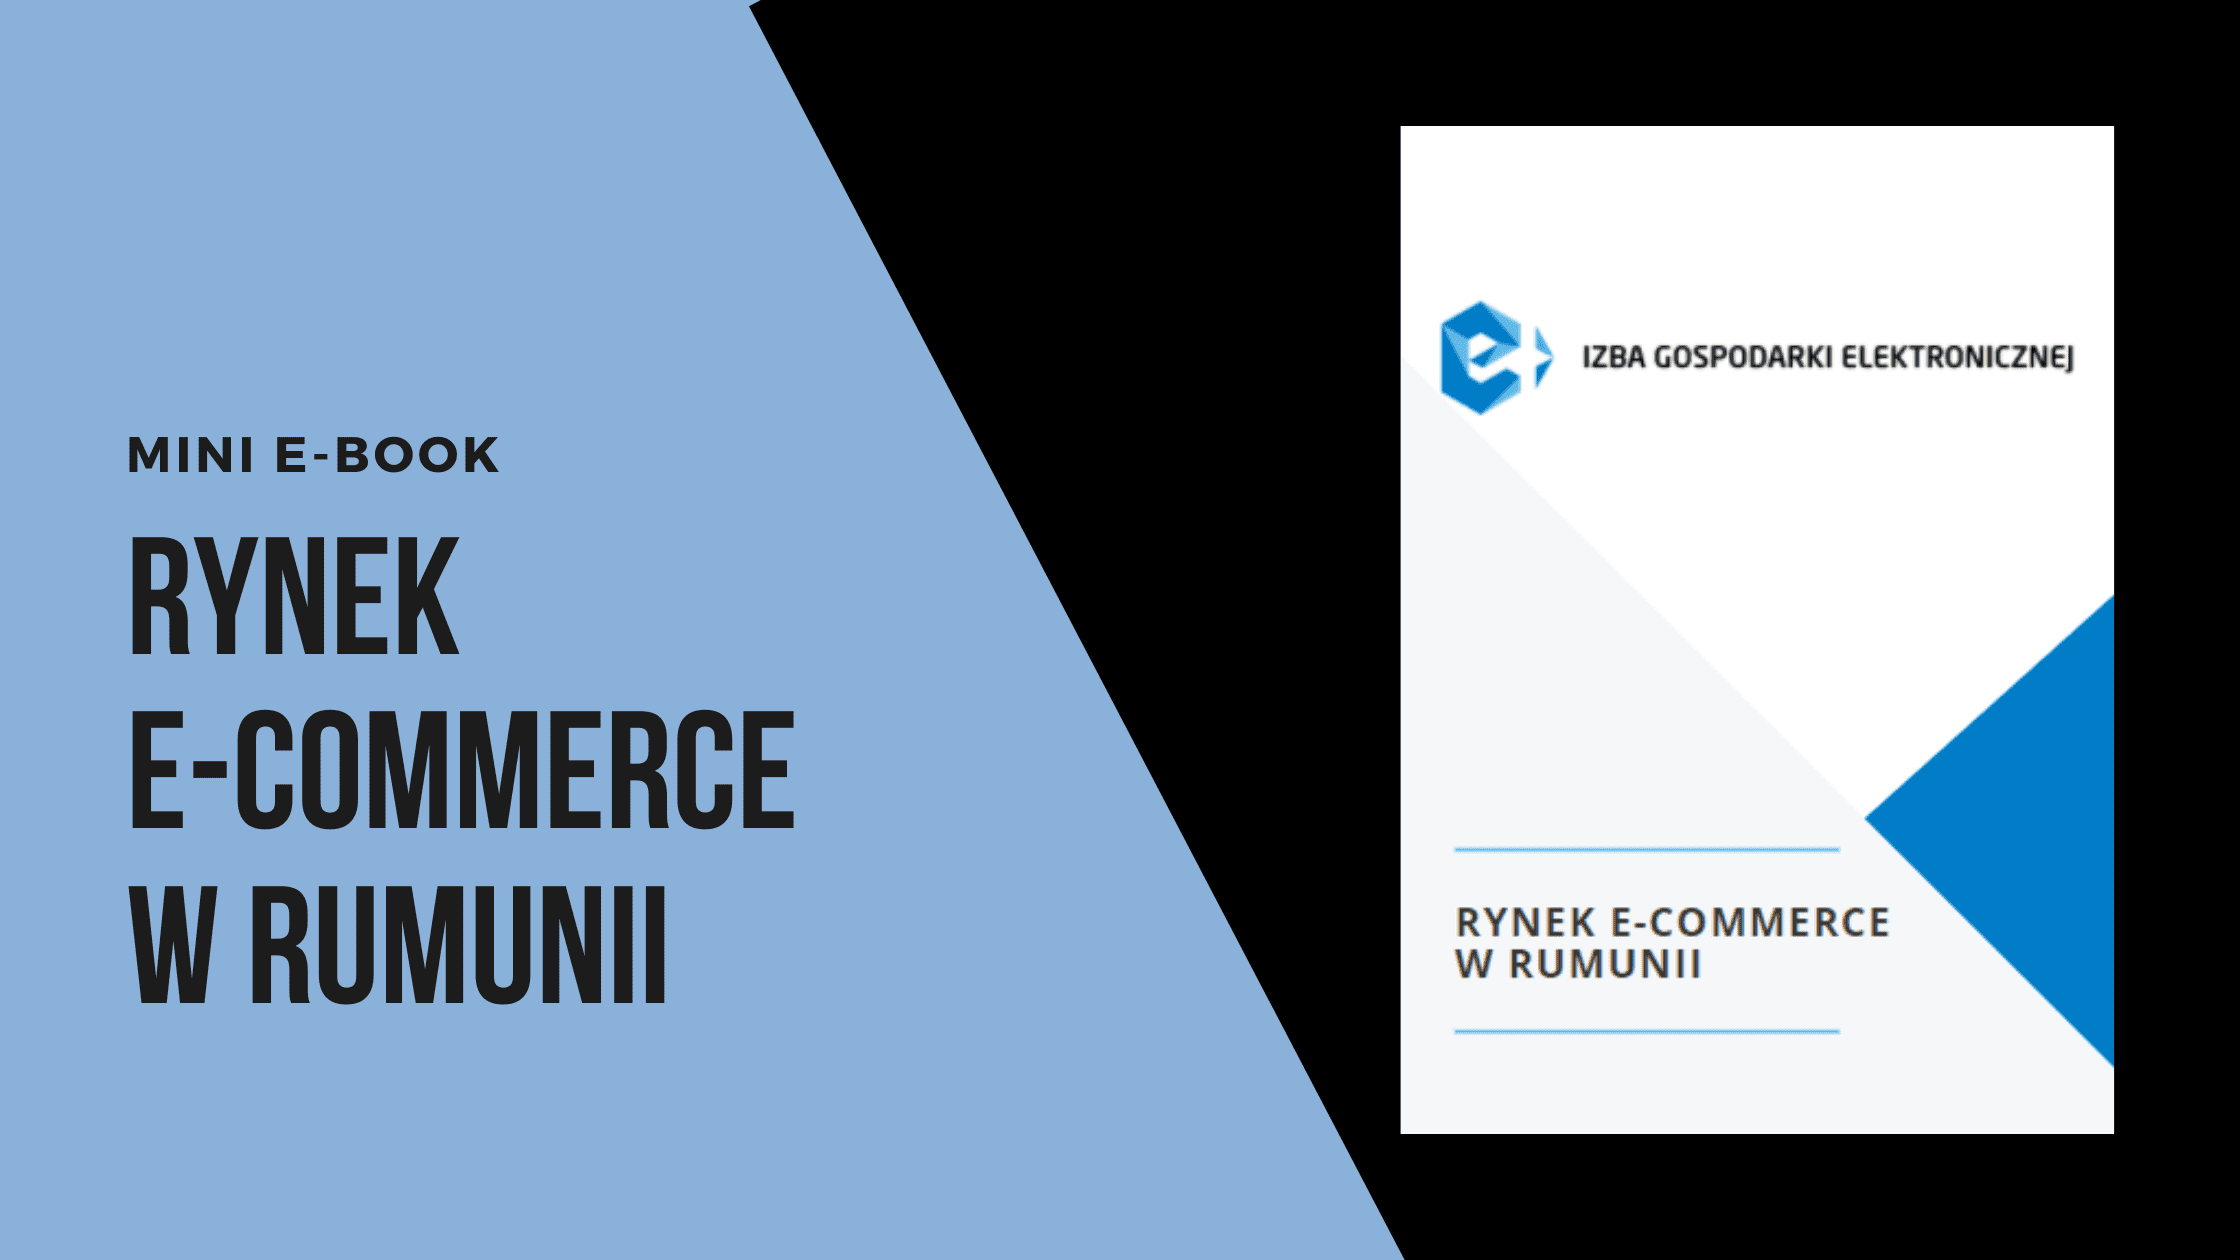 Rynek e-commerce w Rumunii